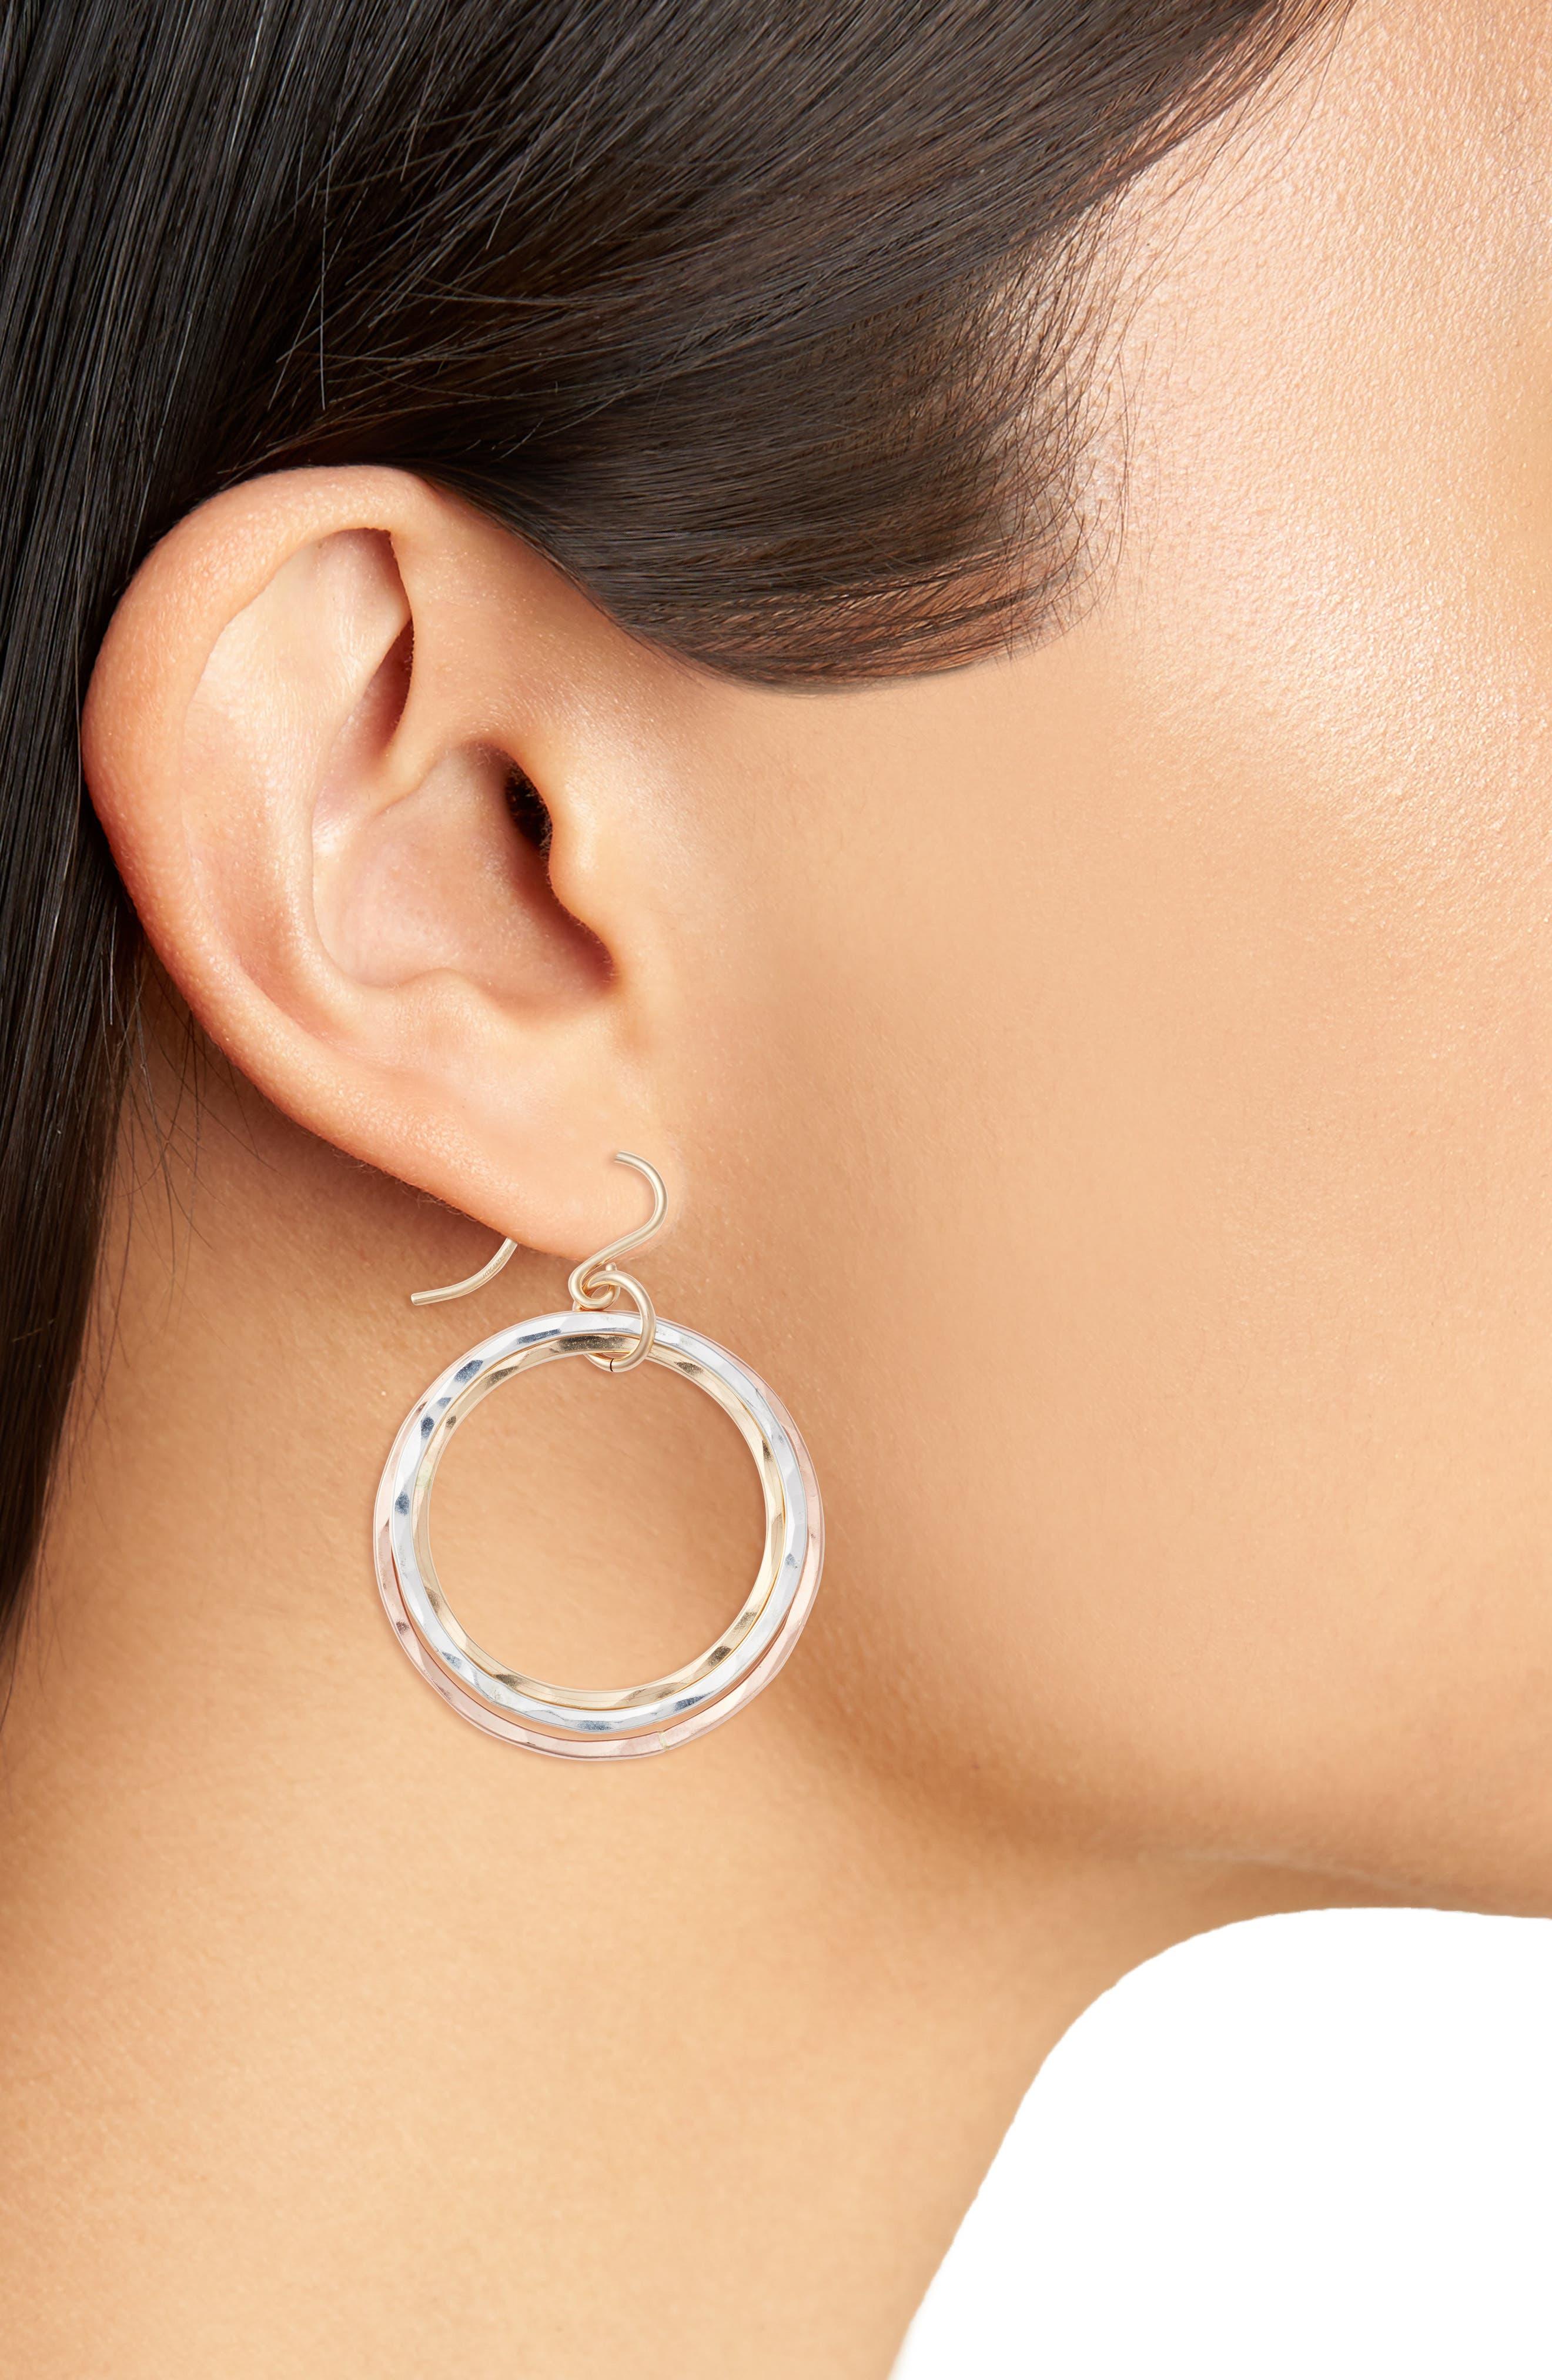 Wellness Small Hoop Earrings,                             Alternate thumbnail 2, color,                             715